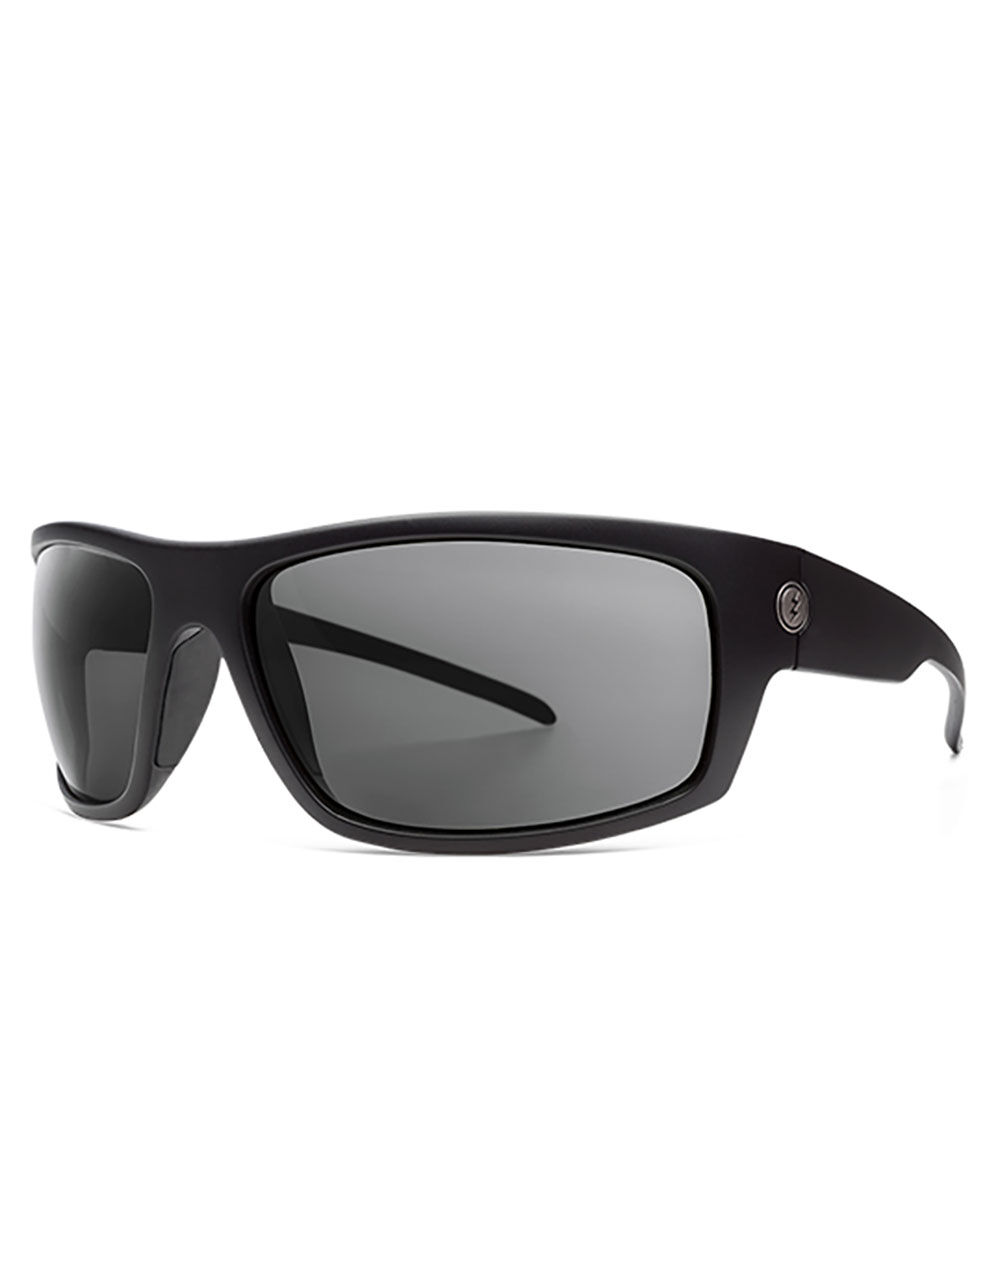 ELECTRIC Tech One XLS Matte Black & Ohm Grey Sunglasses